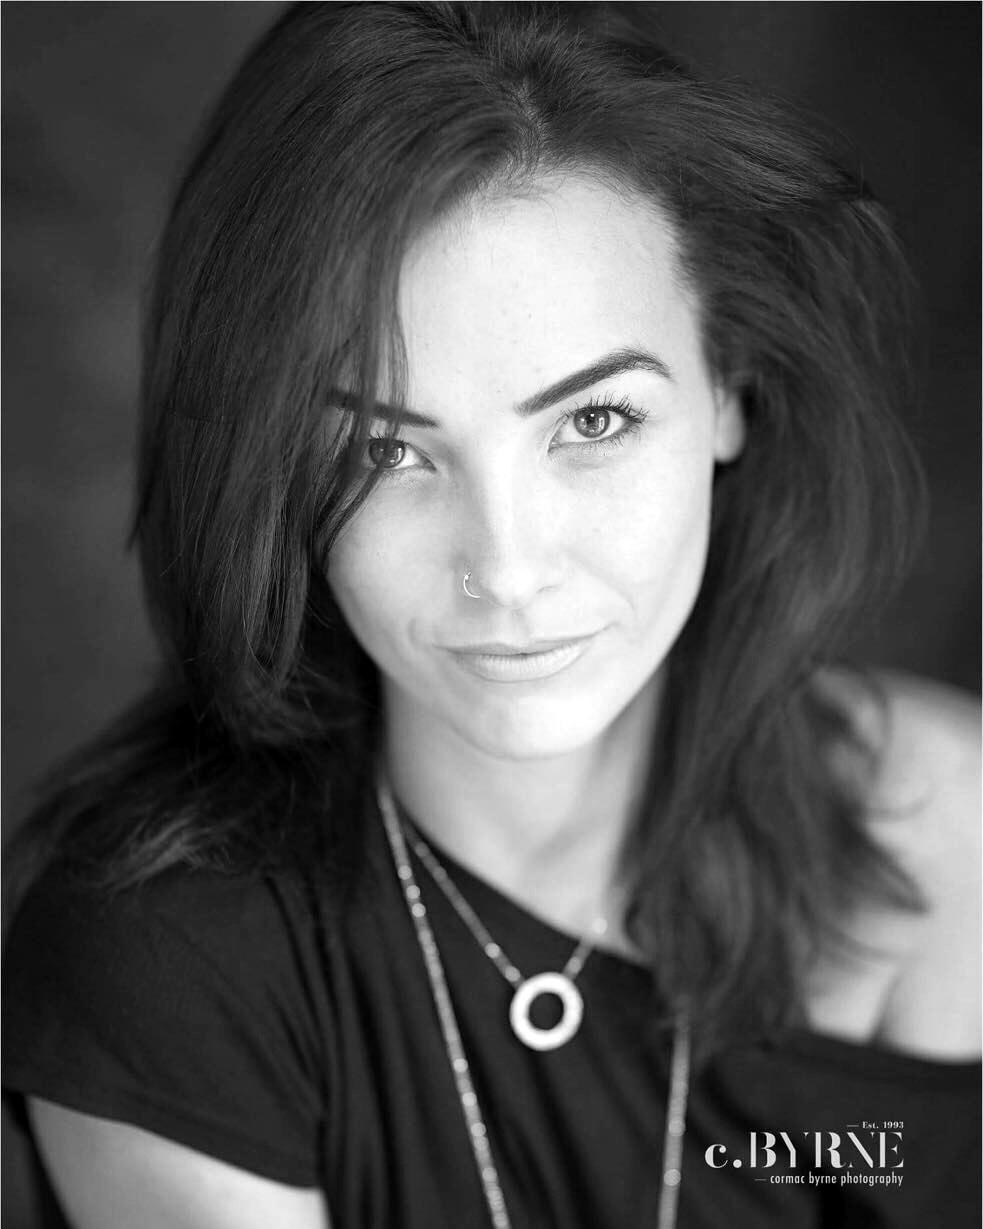 Nicola Bennett - Headshot